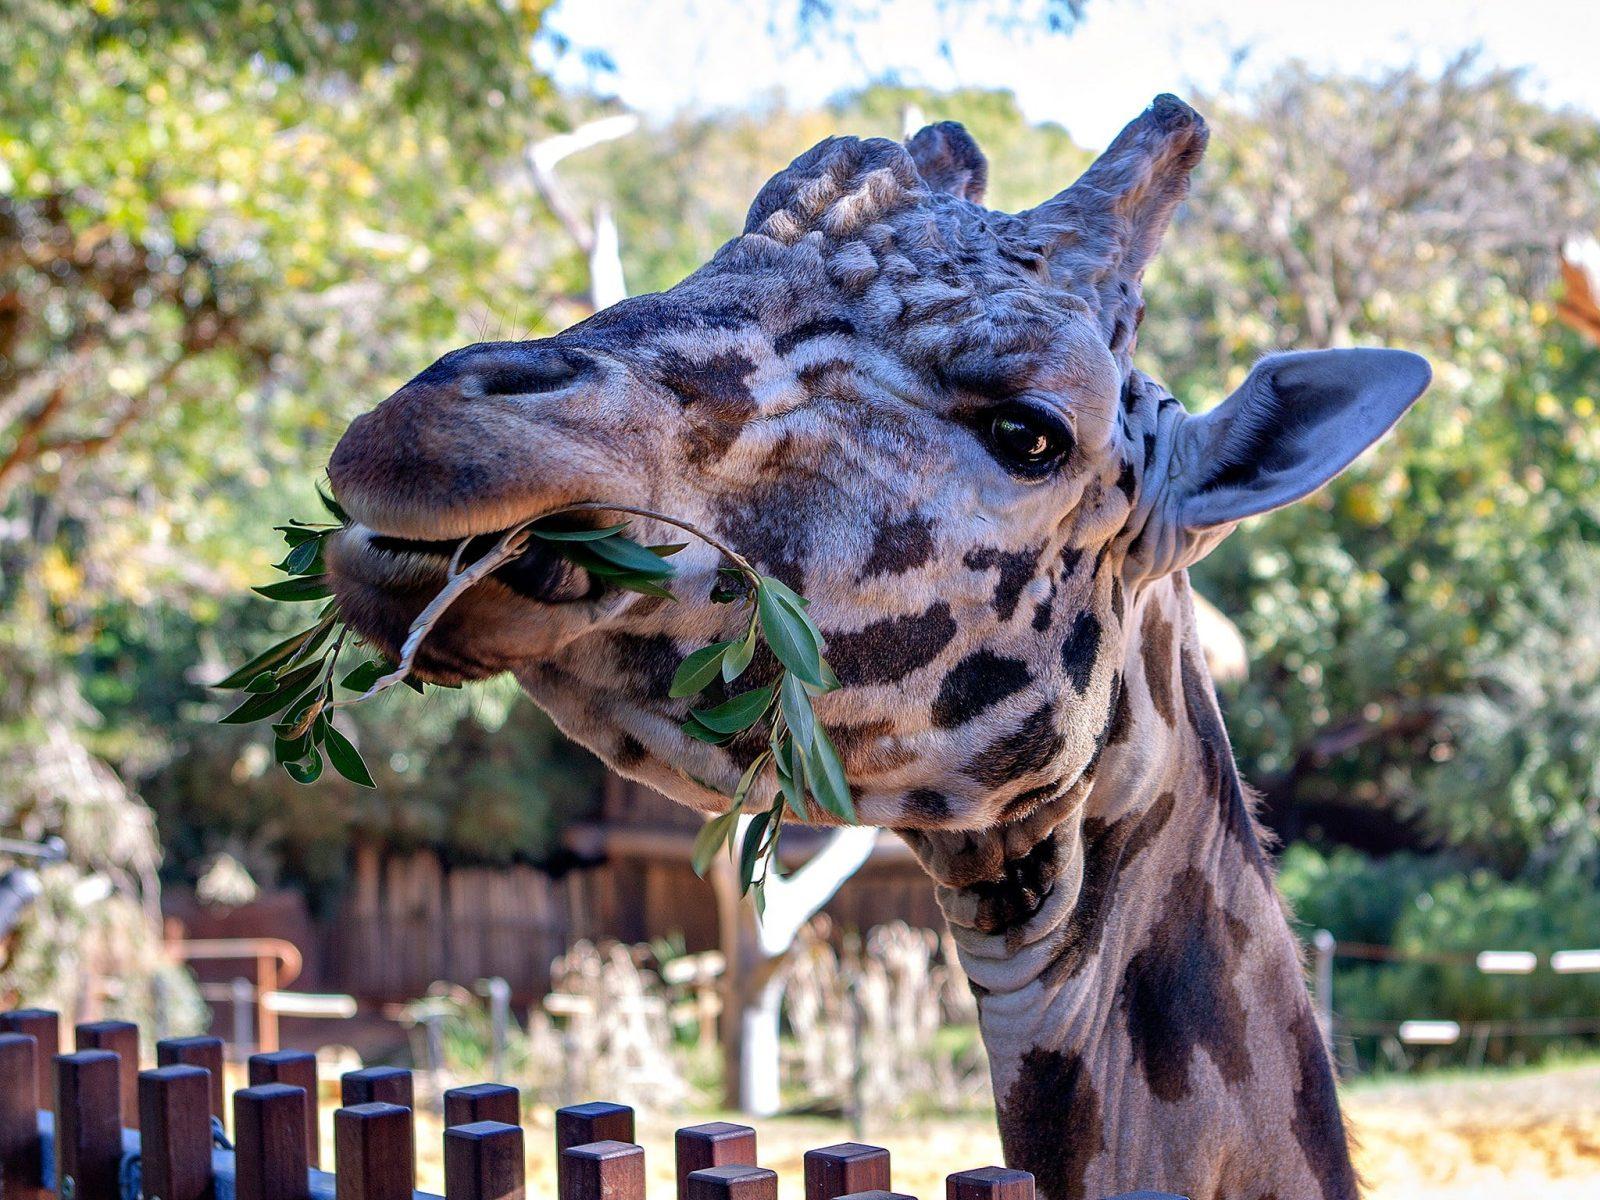 Perth Zoo, South Perth, Western Australia